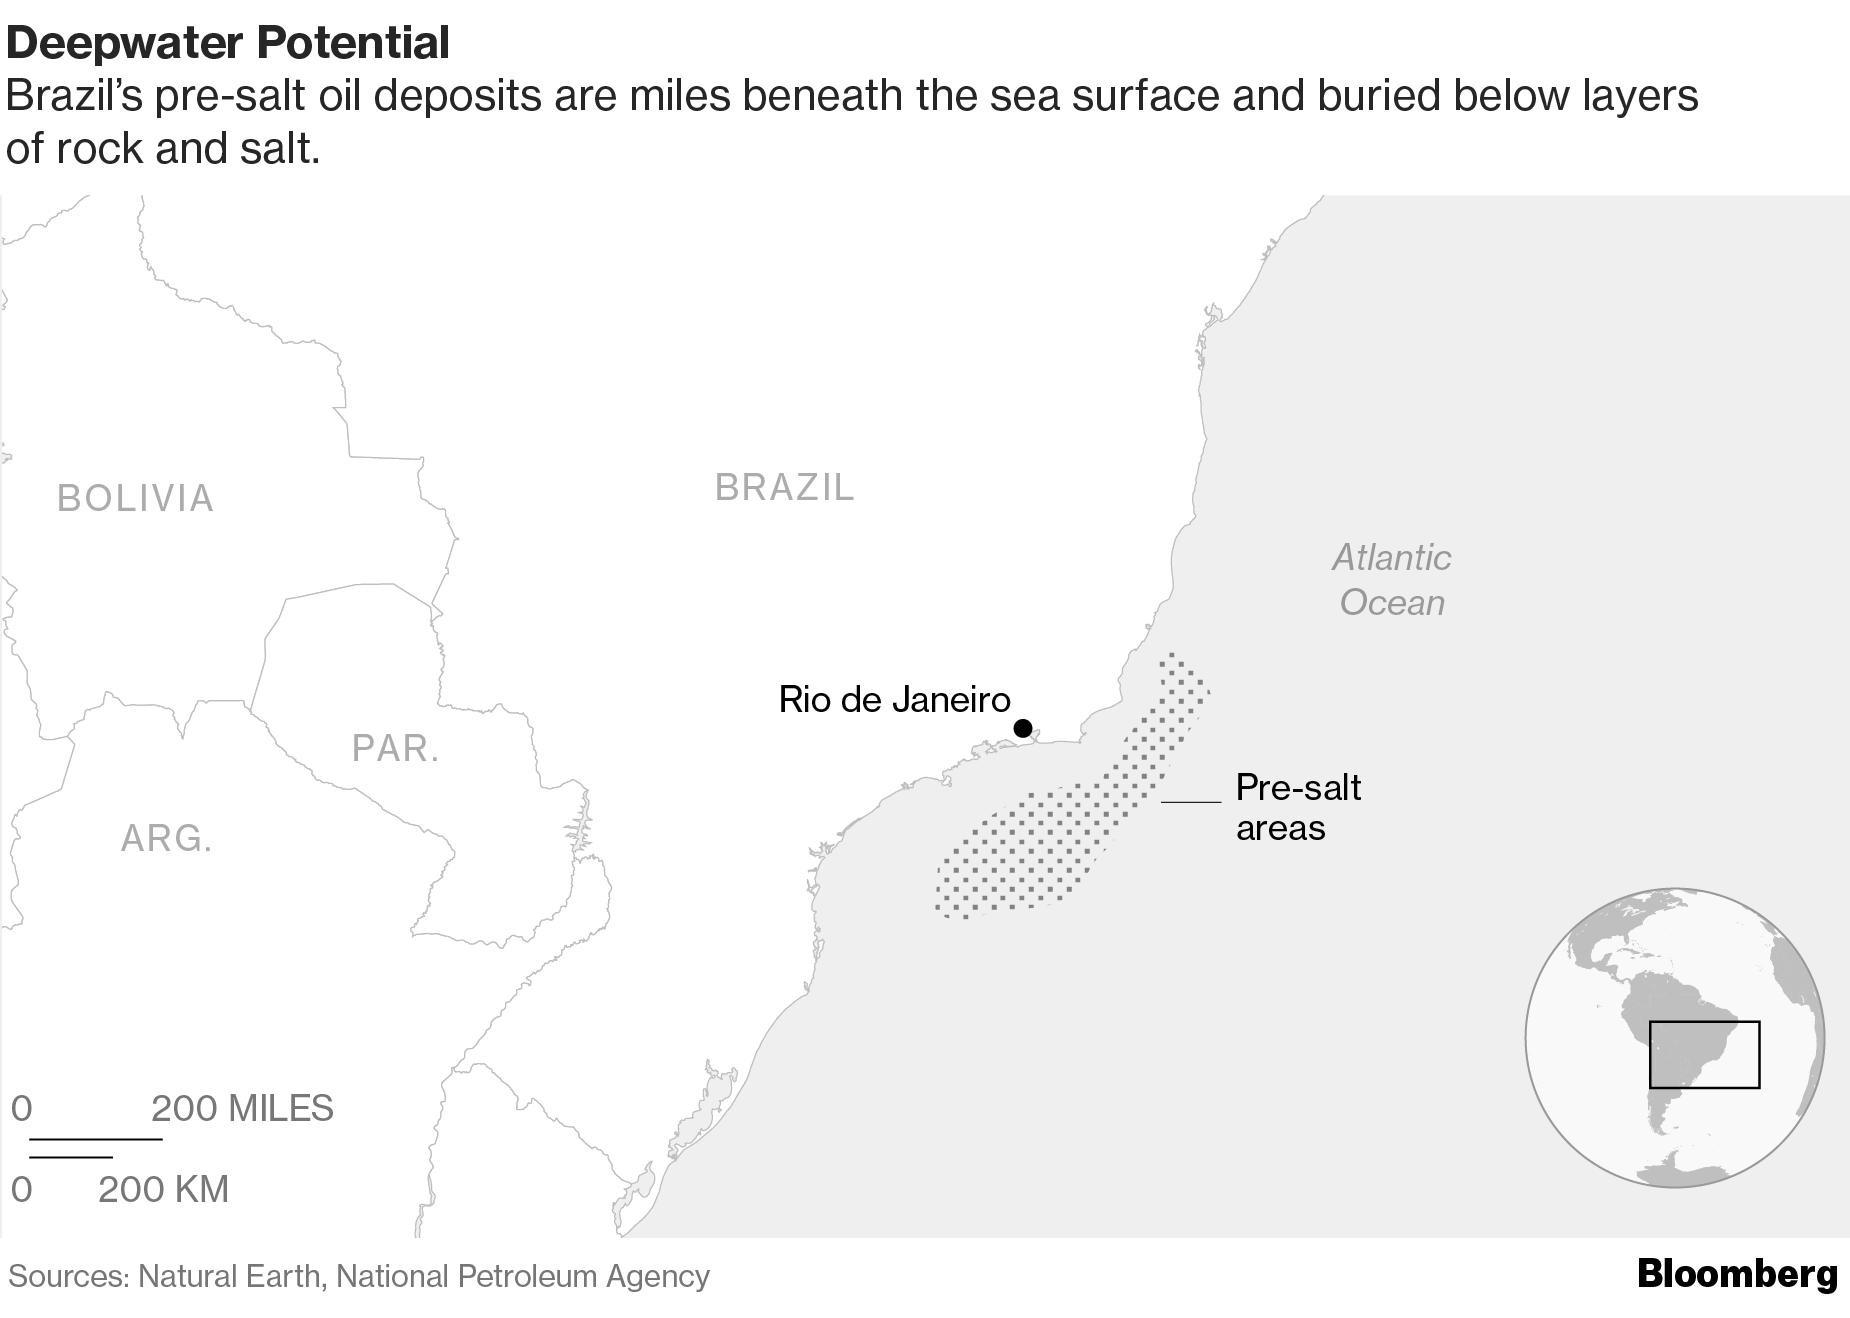 GRAPHIC: Brazil's offshore pre-salt areas